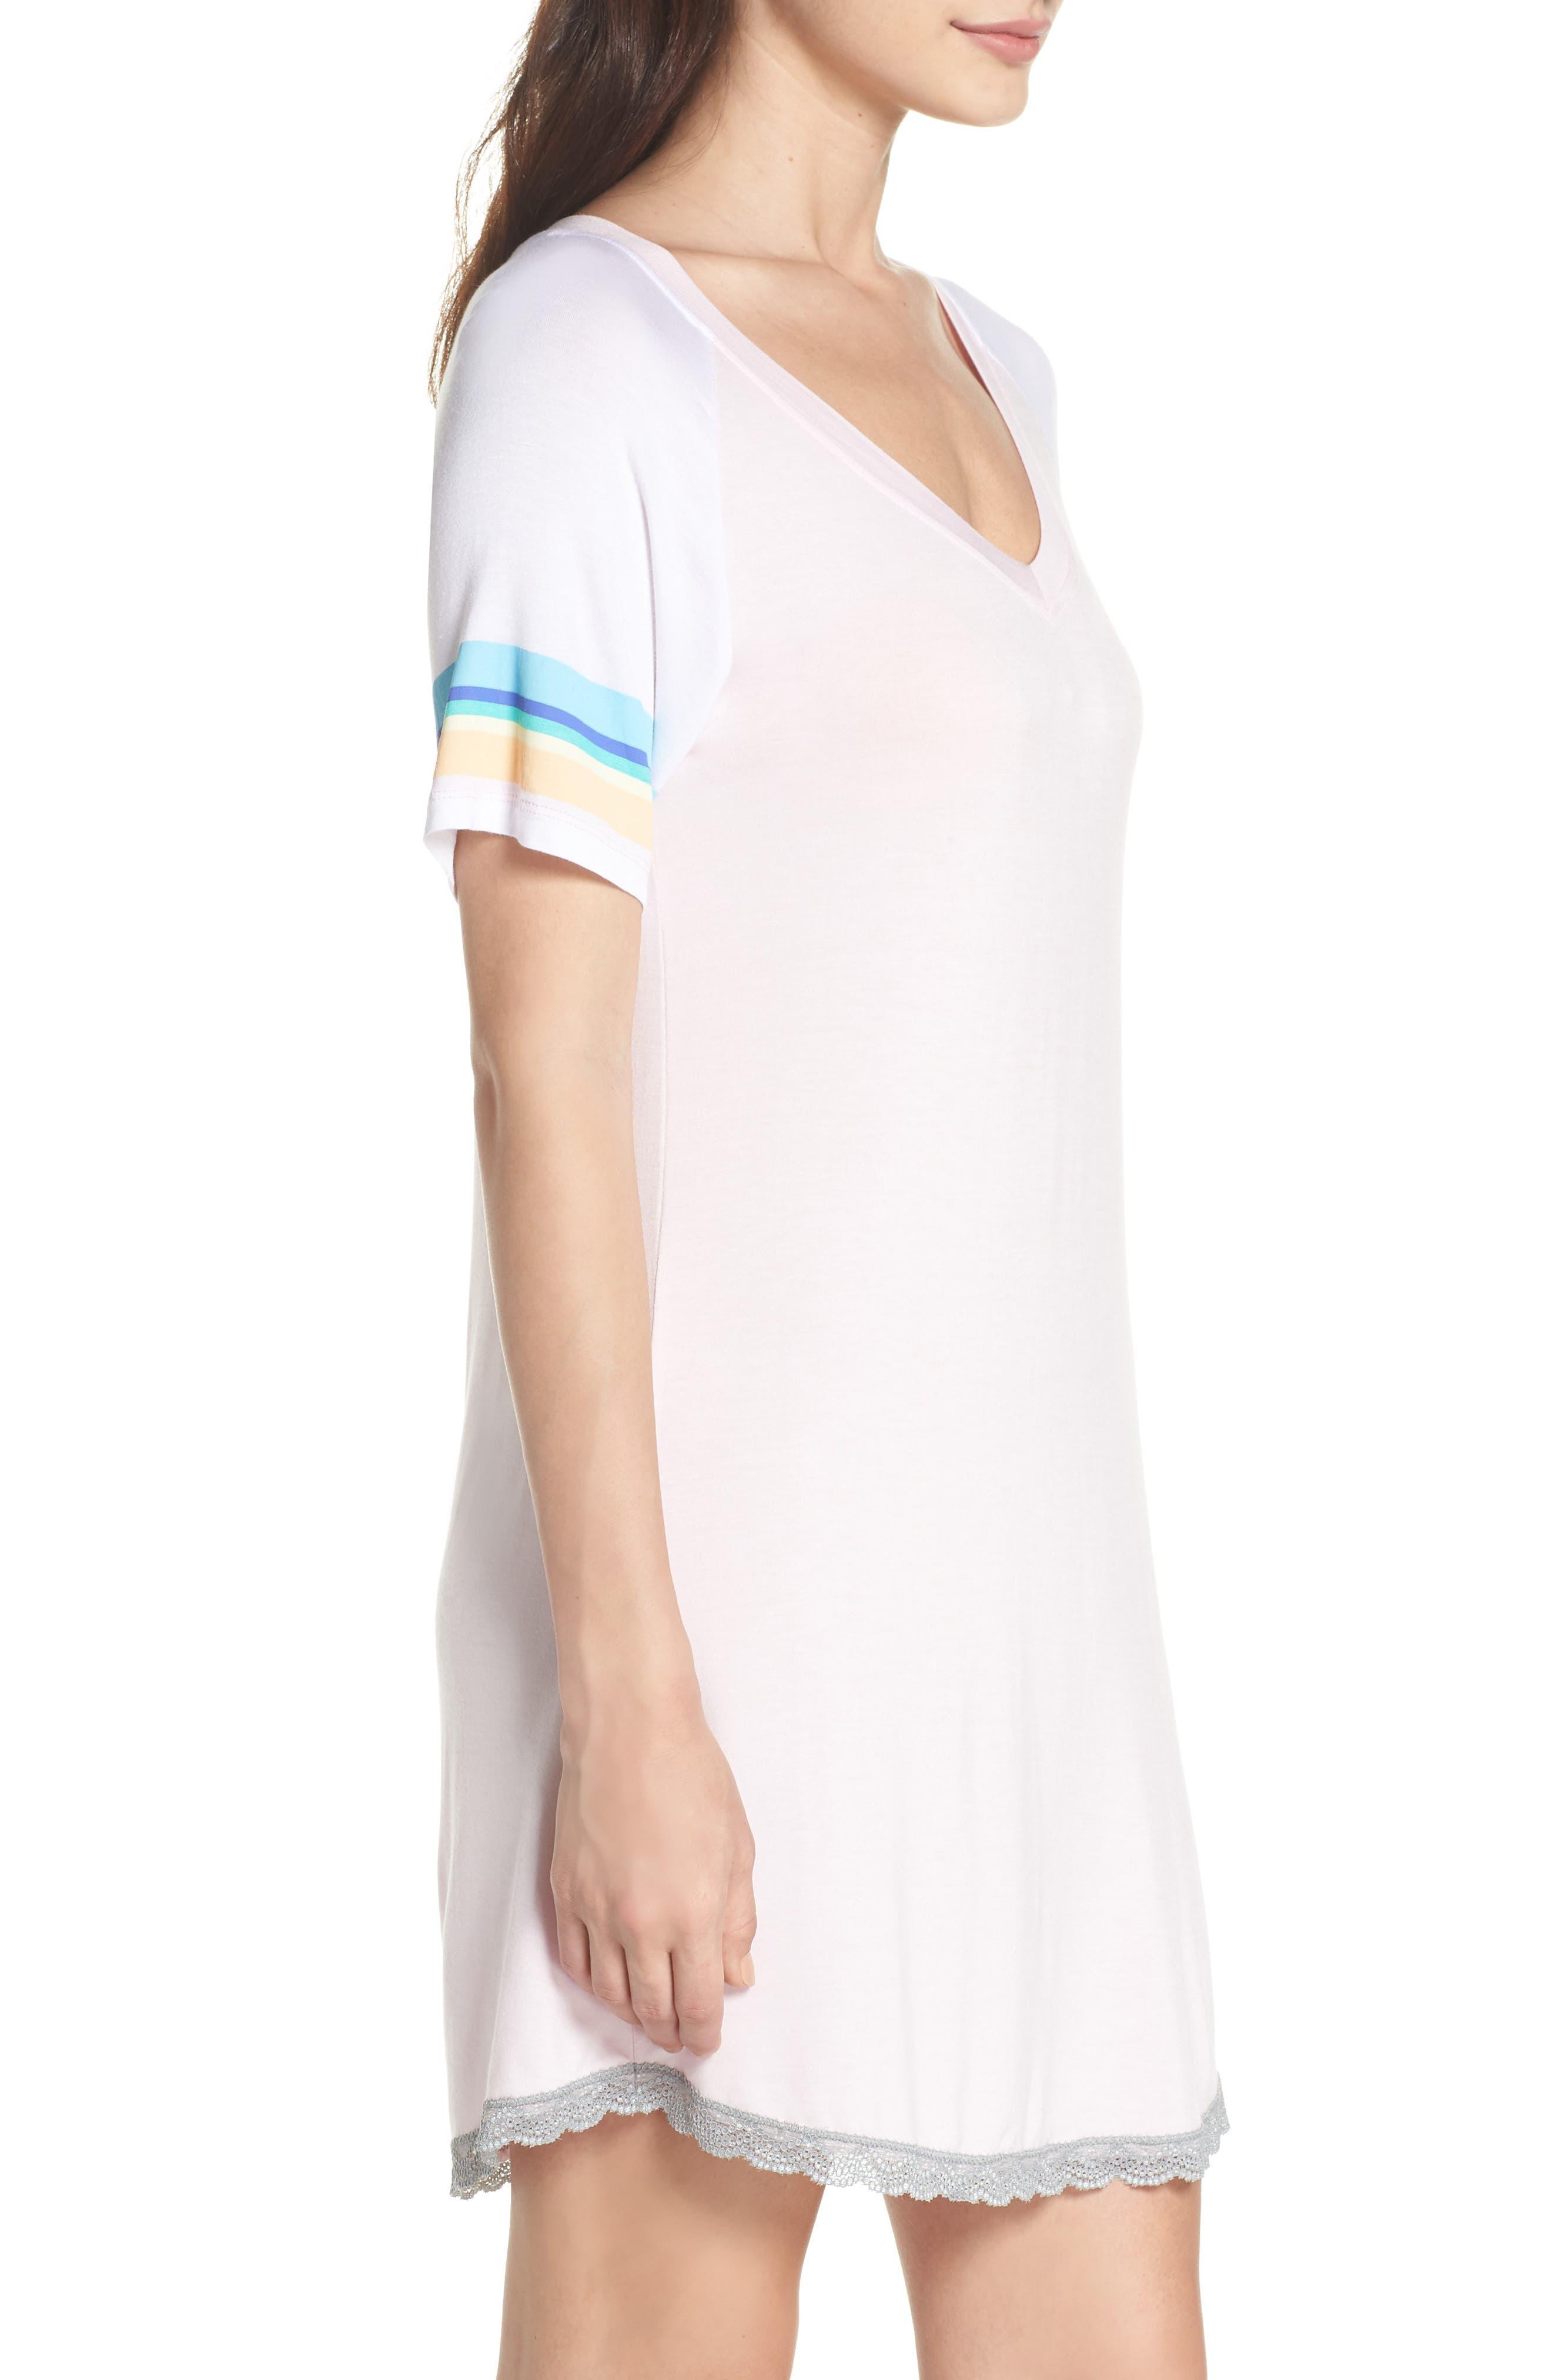 Honeydew Lace Trim Sleep Shirt,                             Alternate thumbnail 3, color,                             Cherry Soda